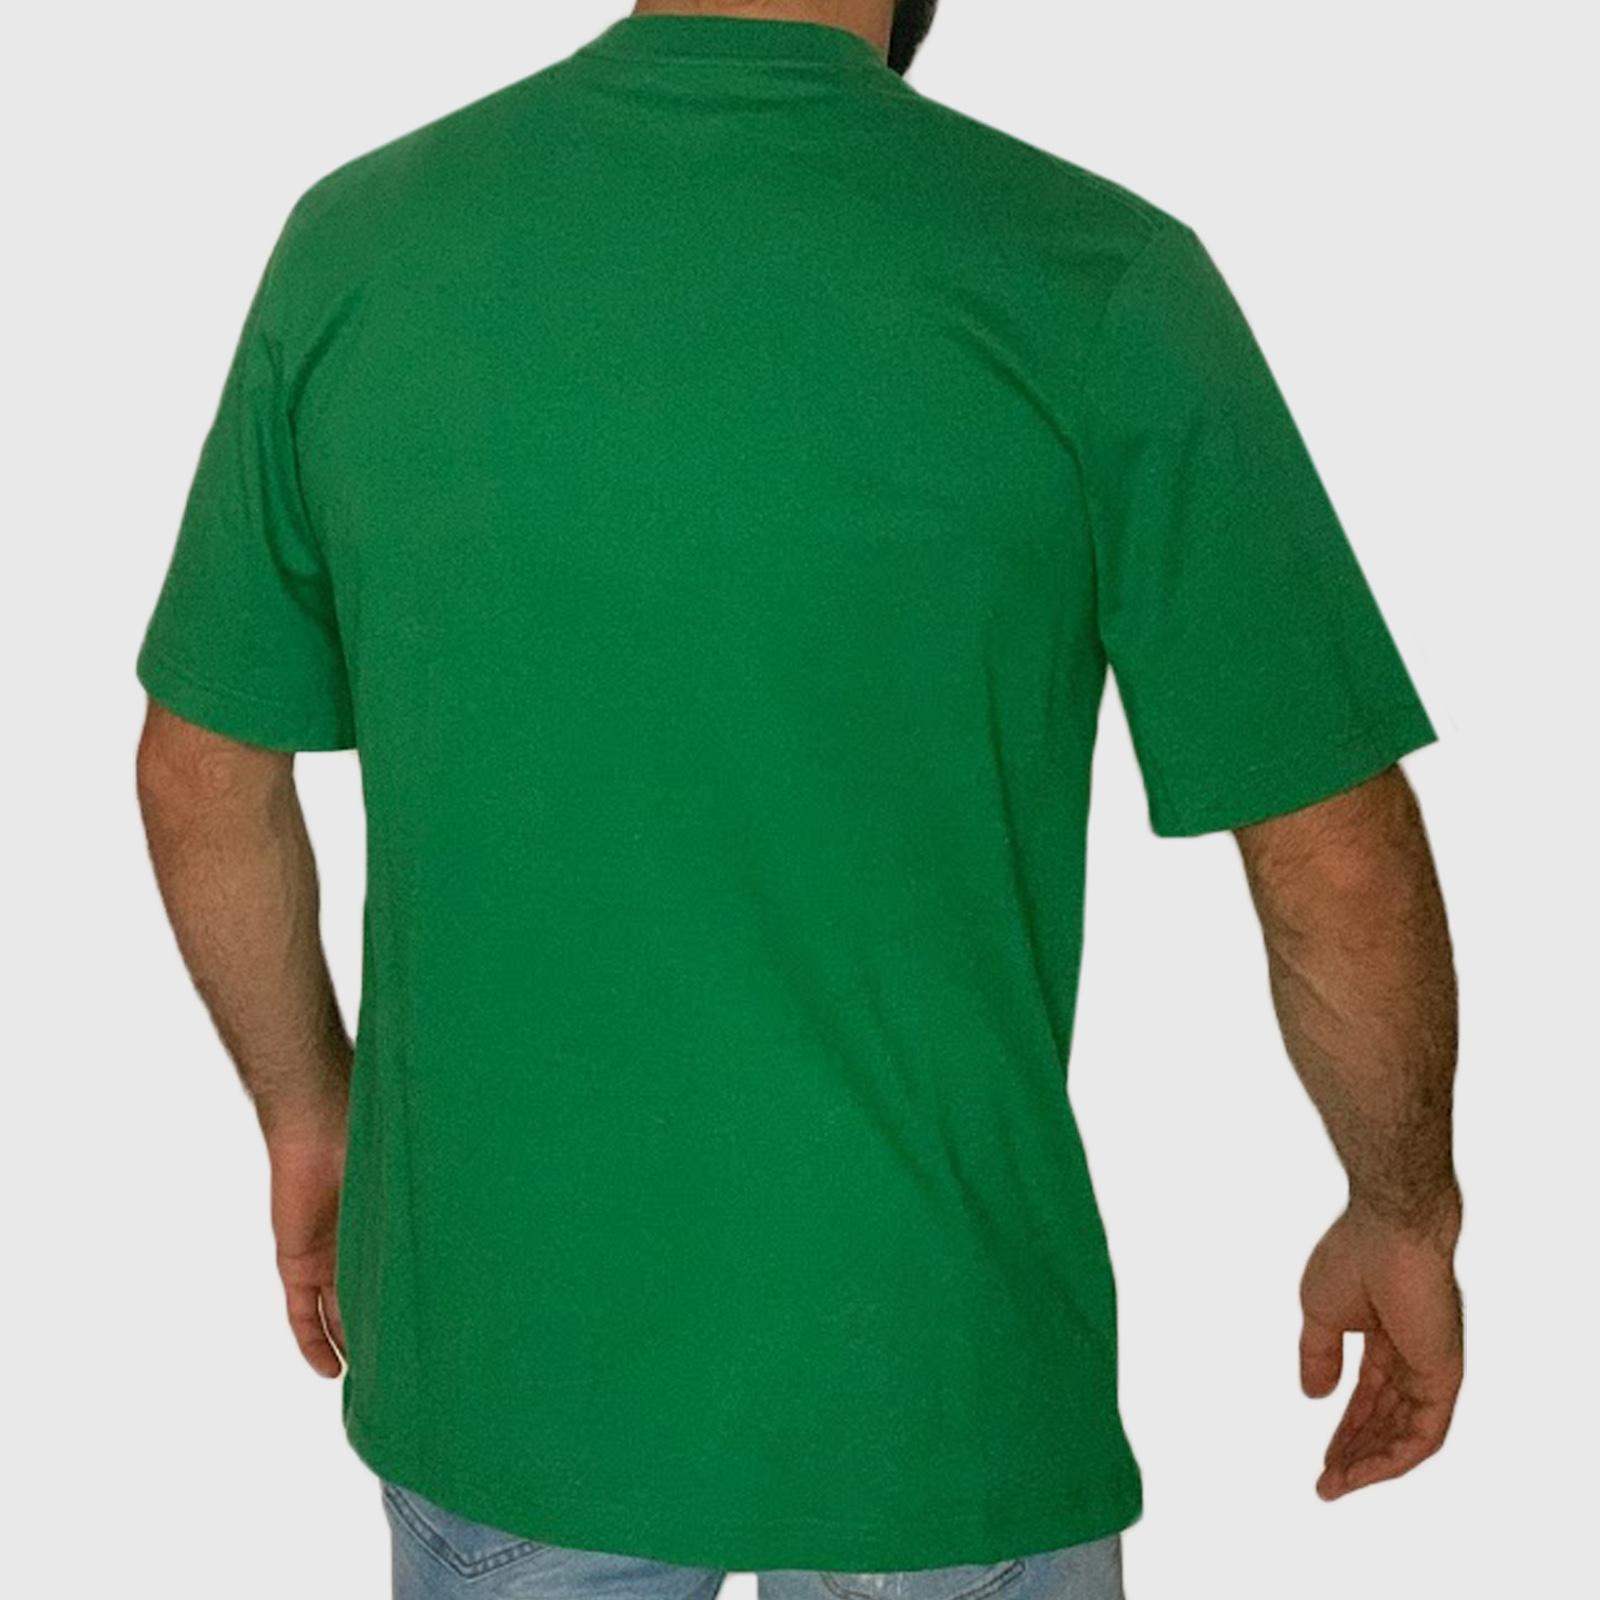 Мужская брендовая футболка Sean John зеленого цвета